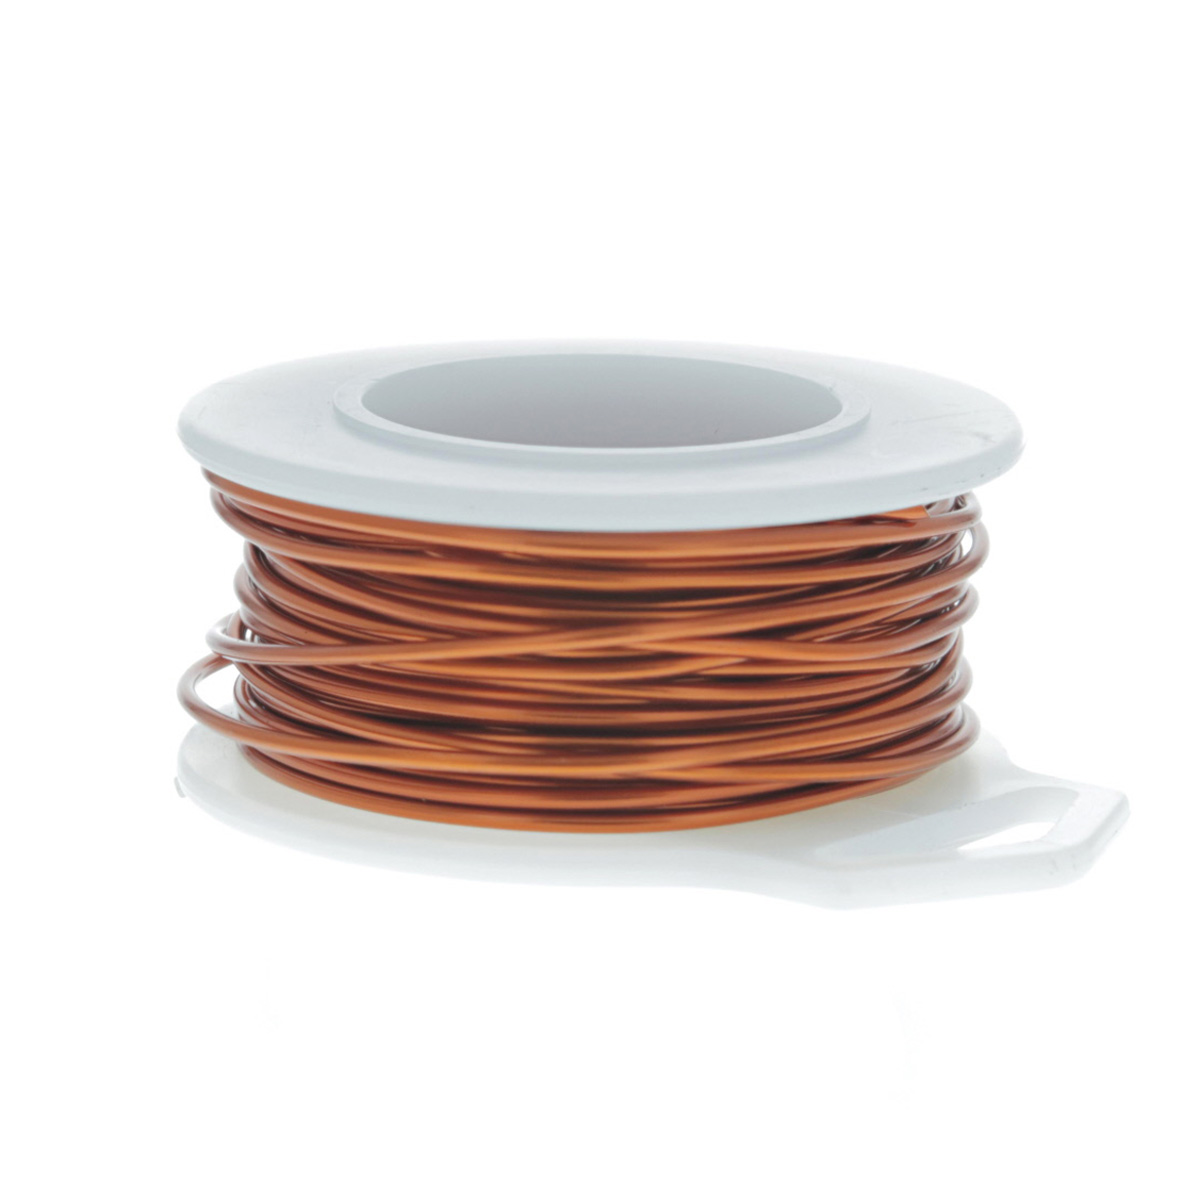 14 gauge round amber enameled craft wire 10 ft wire for 10 gauge craft wire